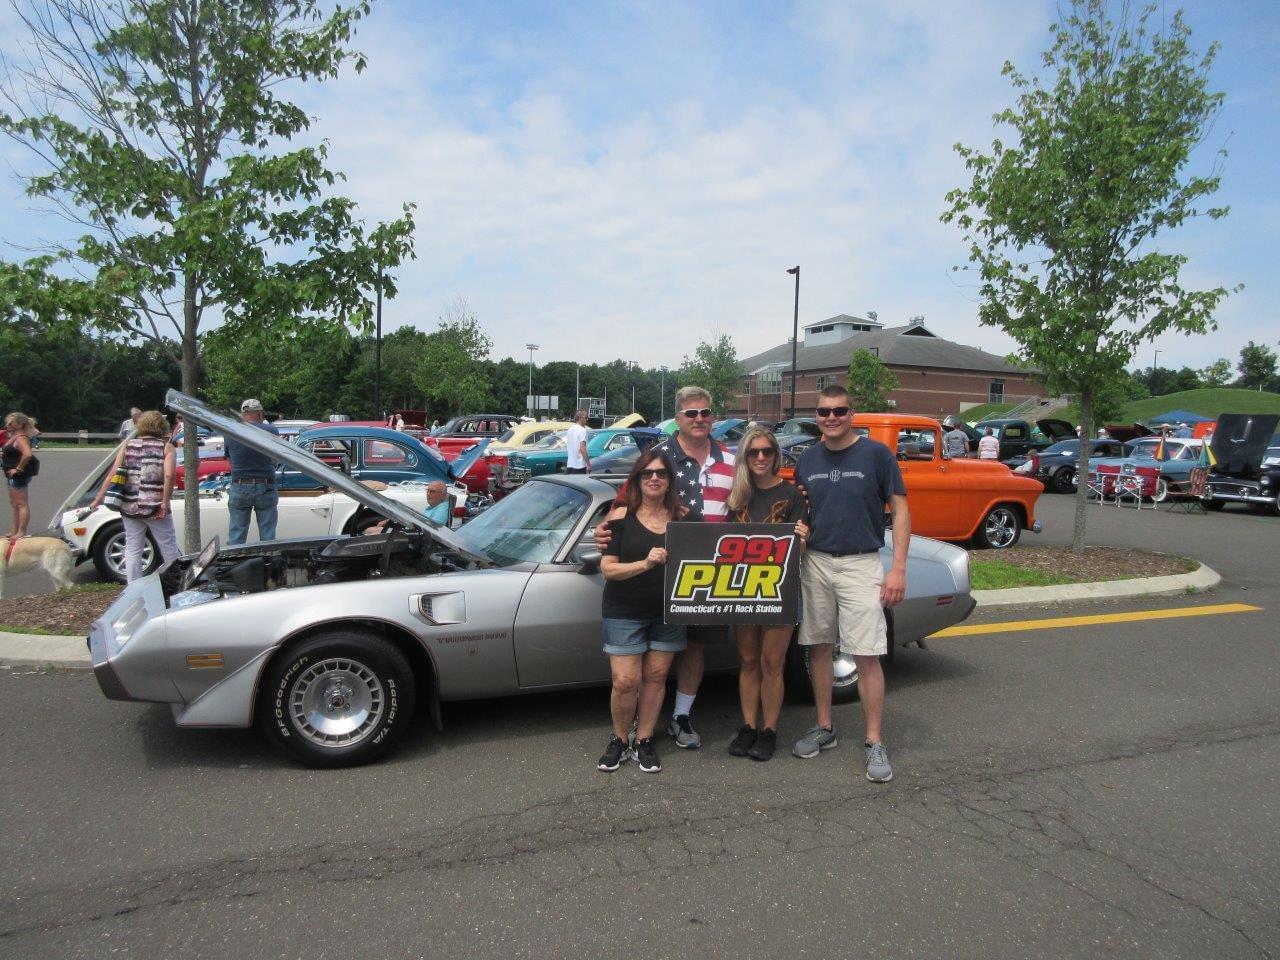 Johnathan McMahon Memorial Scholarship Car Show 7/7/19